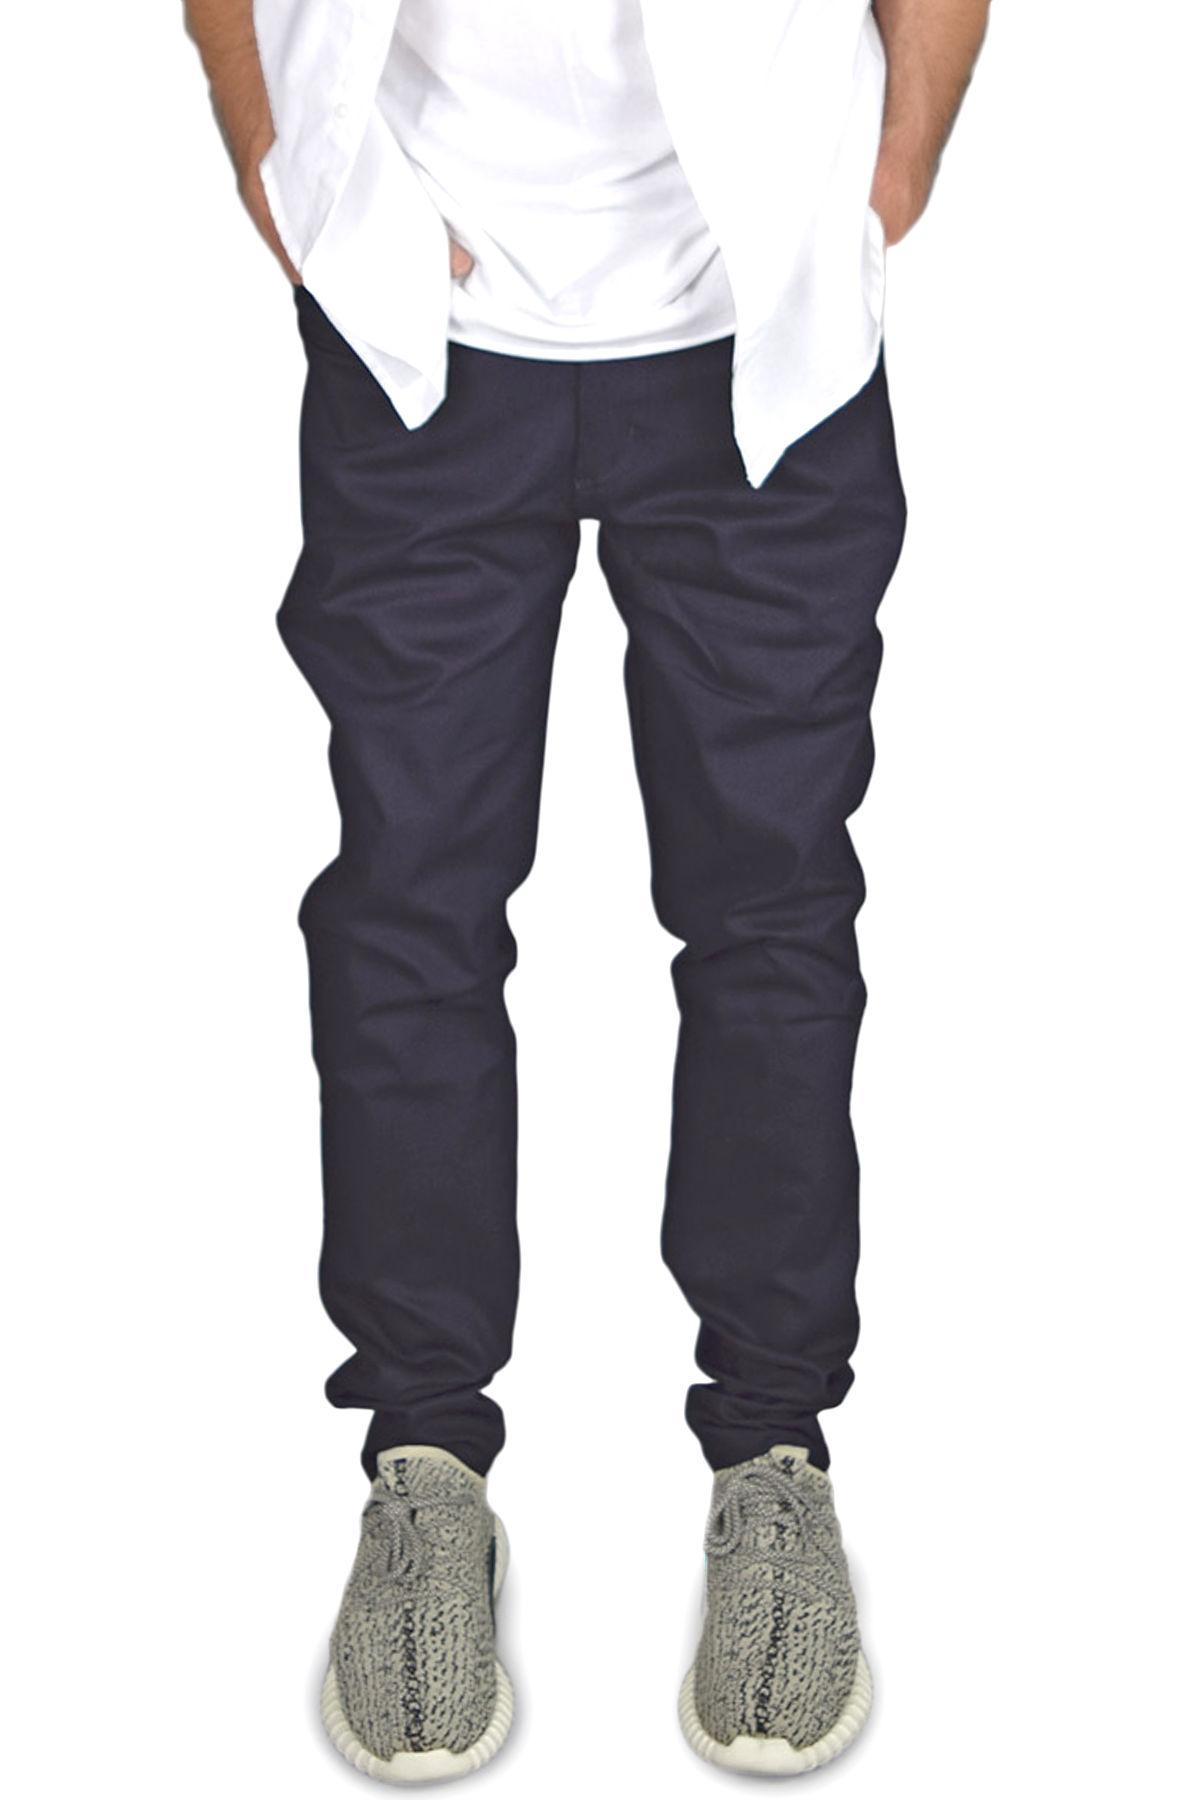 Image of The Stacks Tapered Denim Jeans in Indigo